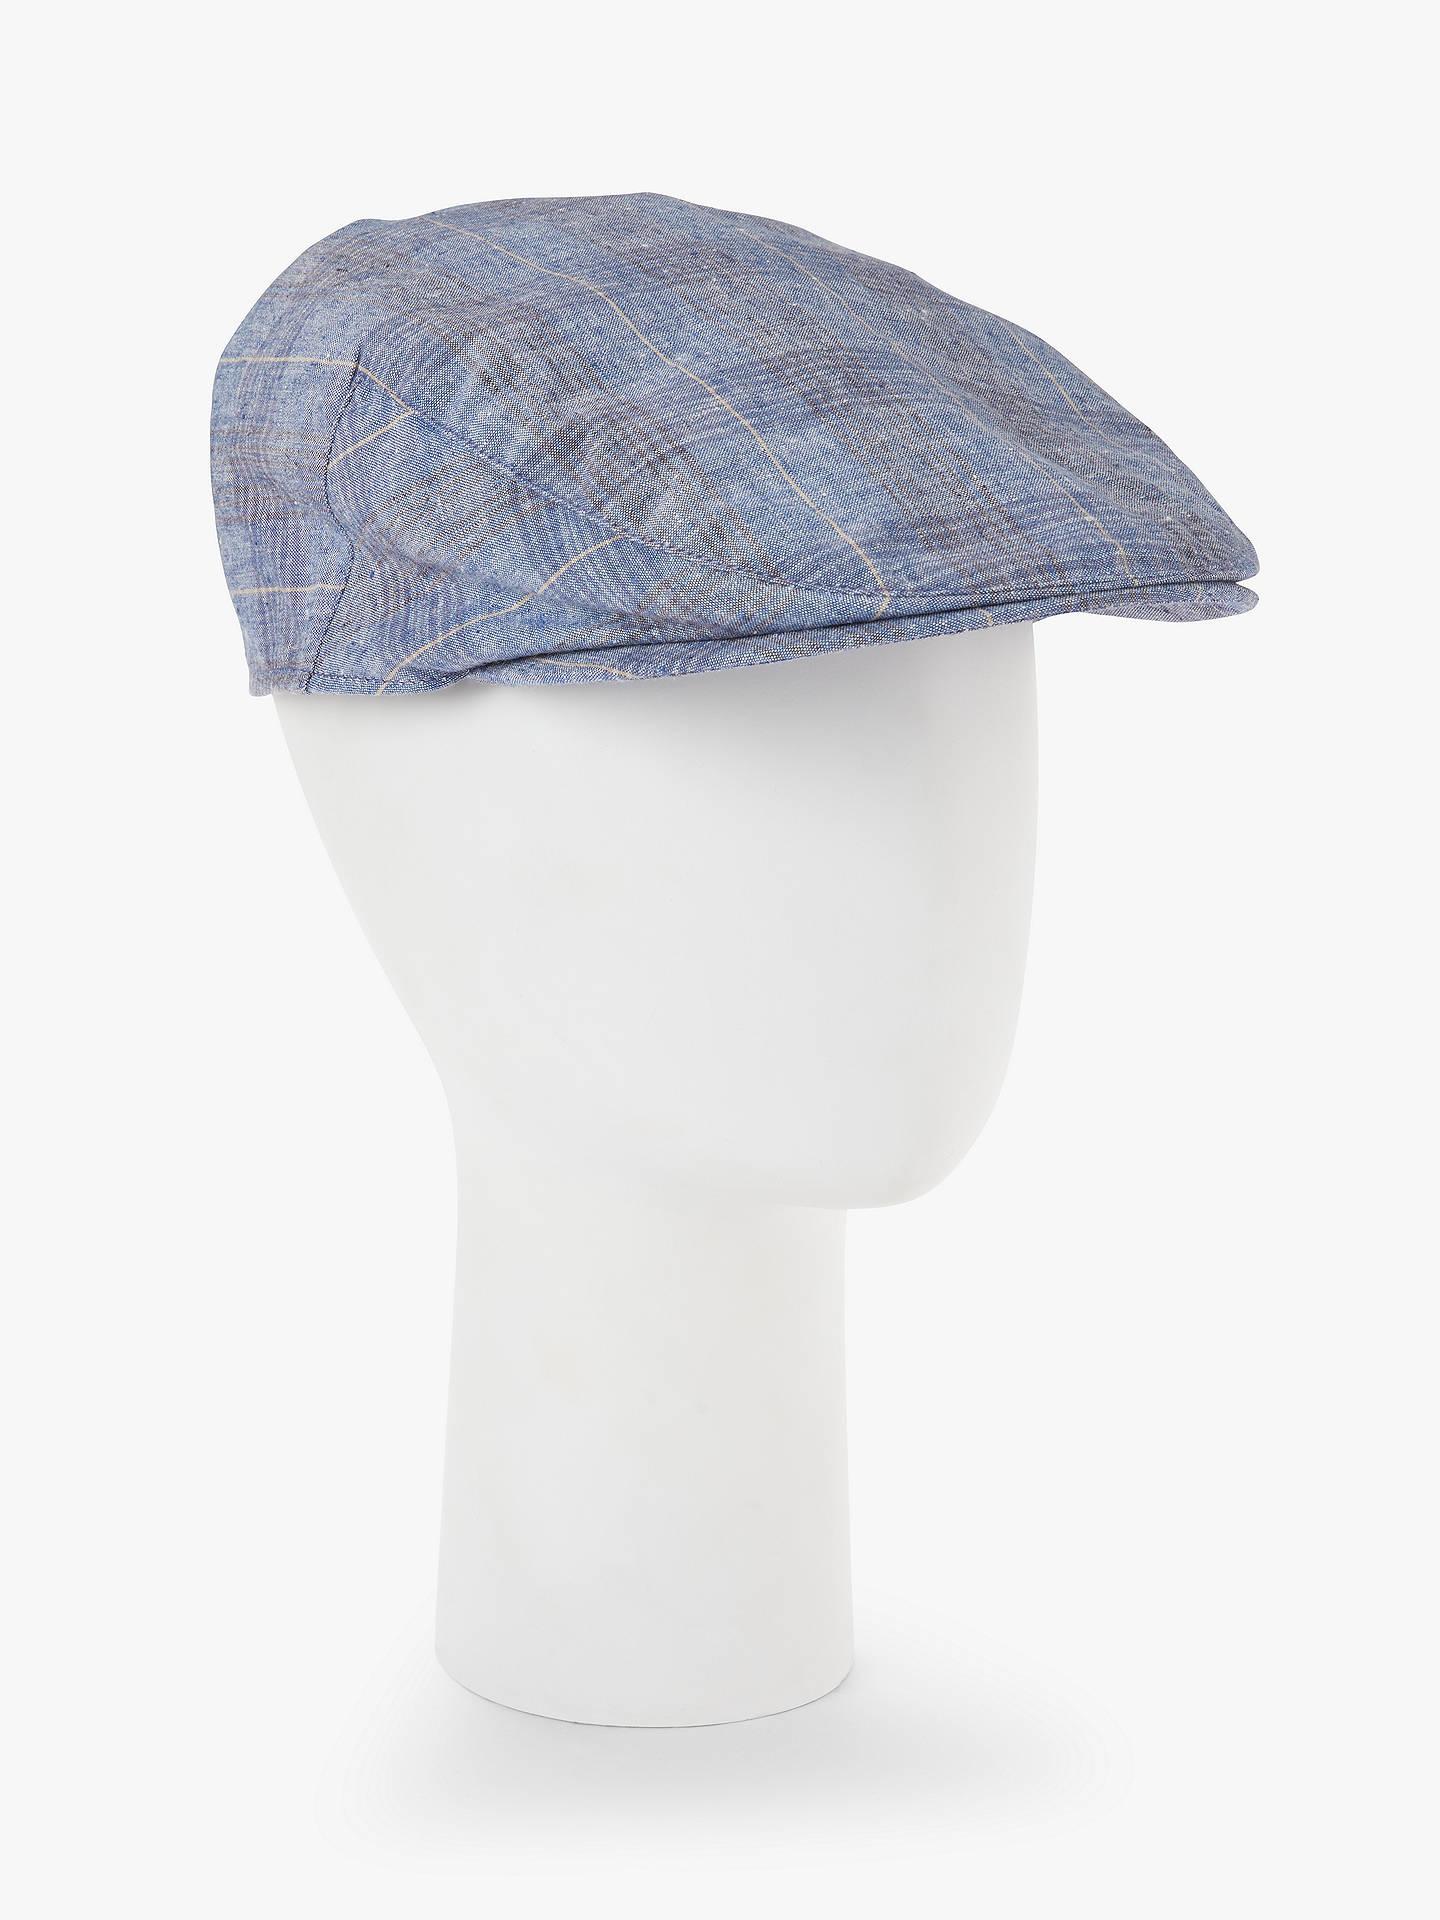 a2155ae10ab BuyJohn Lewis   Partners Cotton Linen Flat Cap